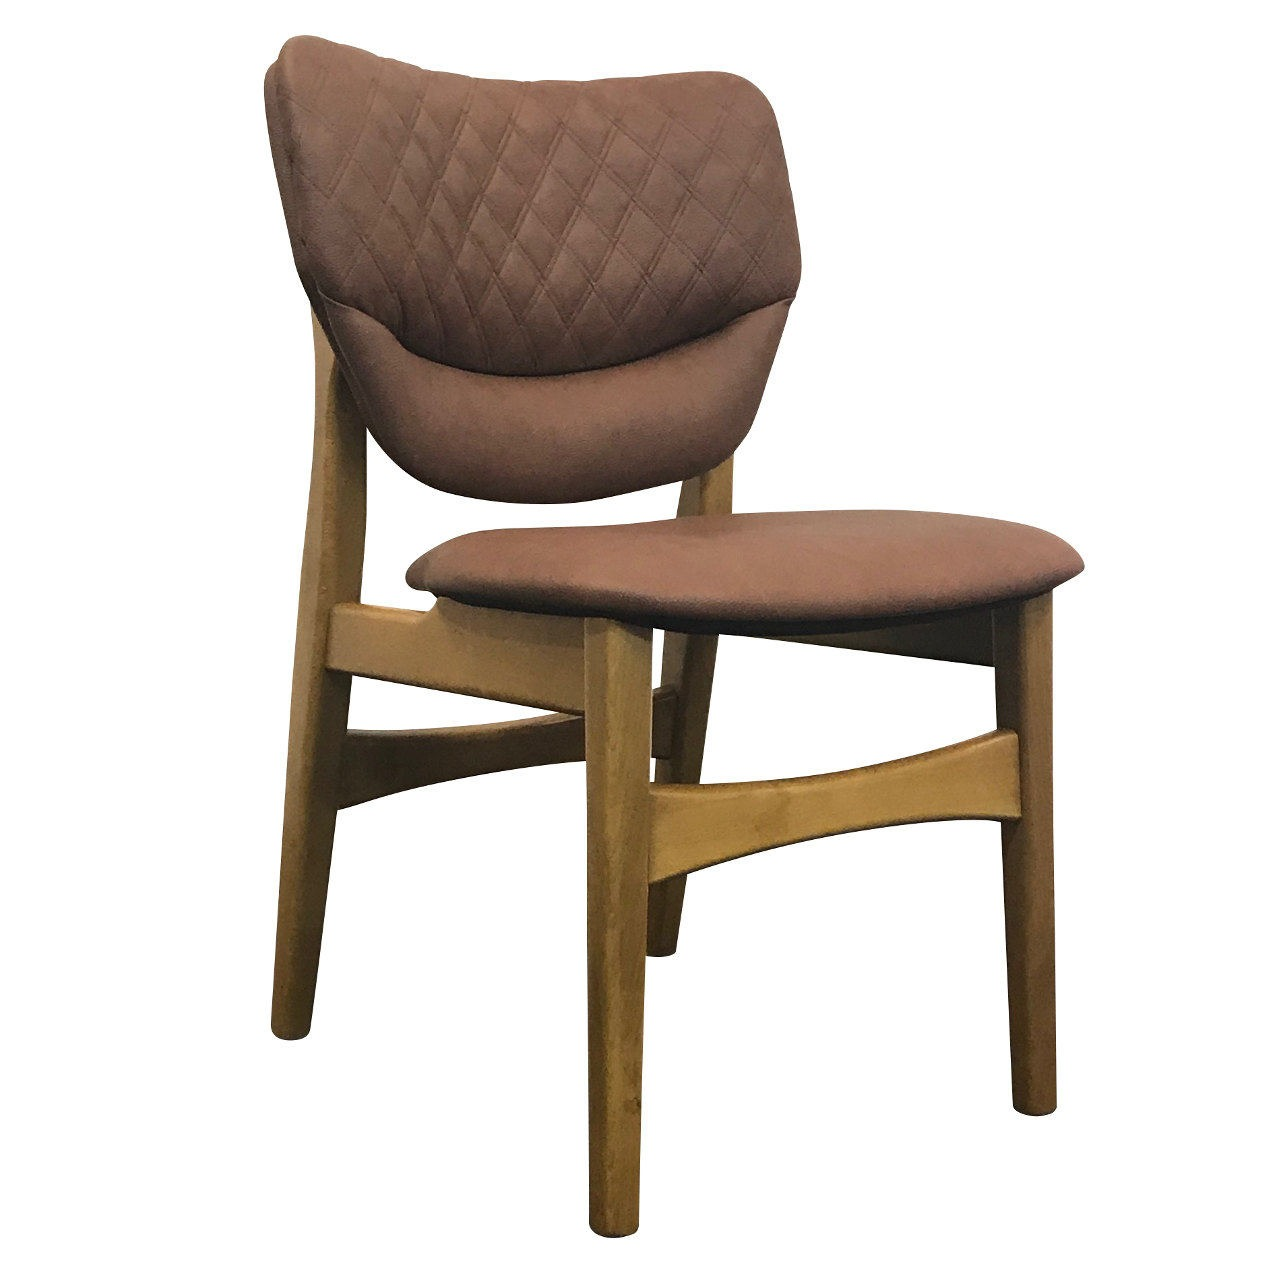 Janice chair, restaurant furniture, hotel furniture, bar furniture